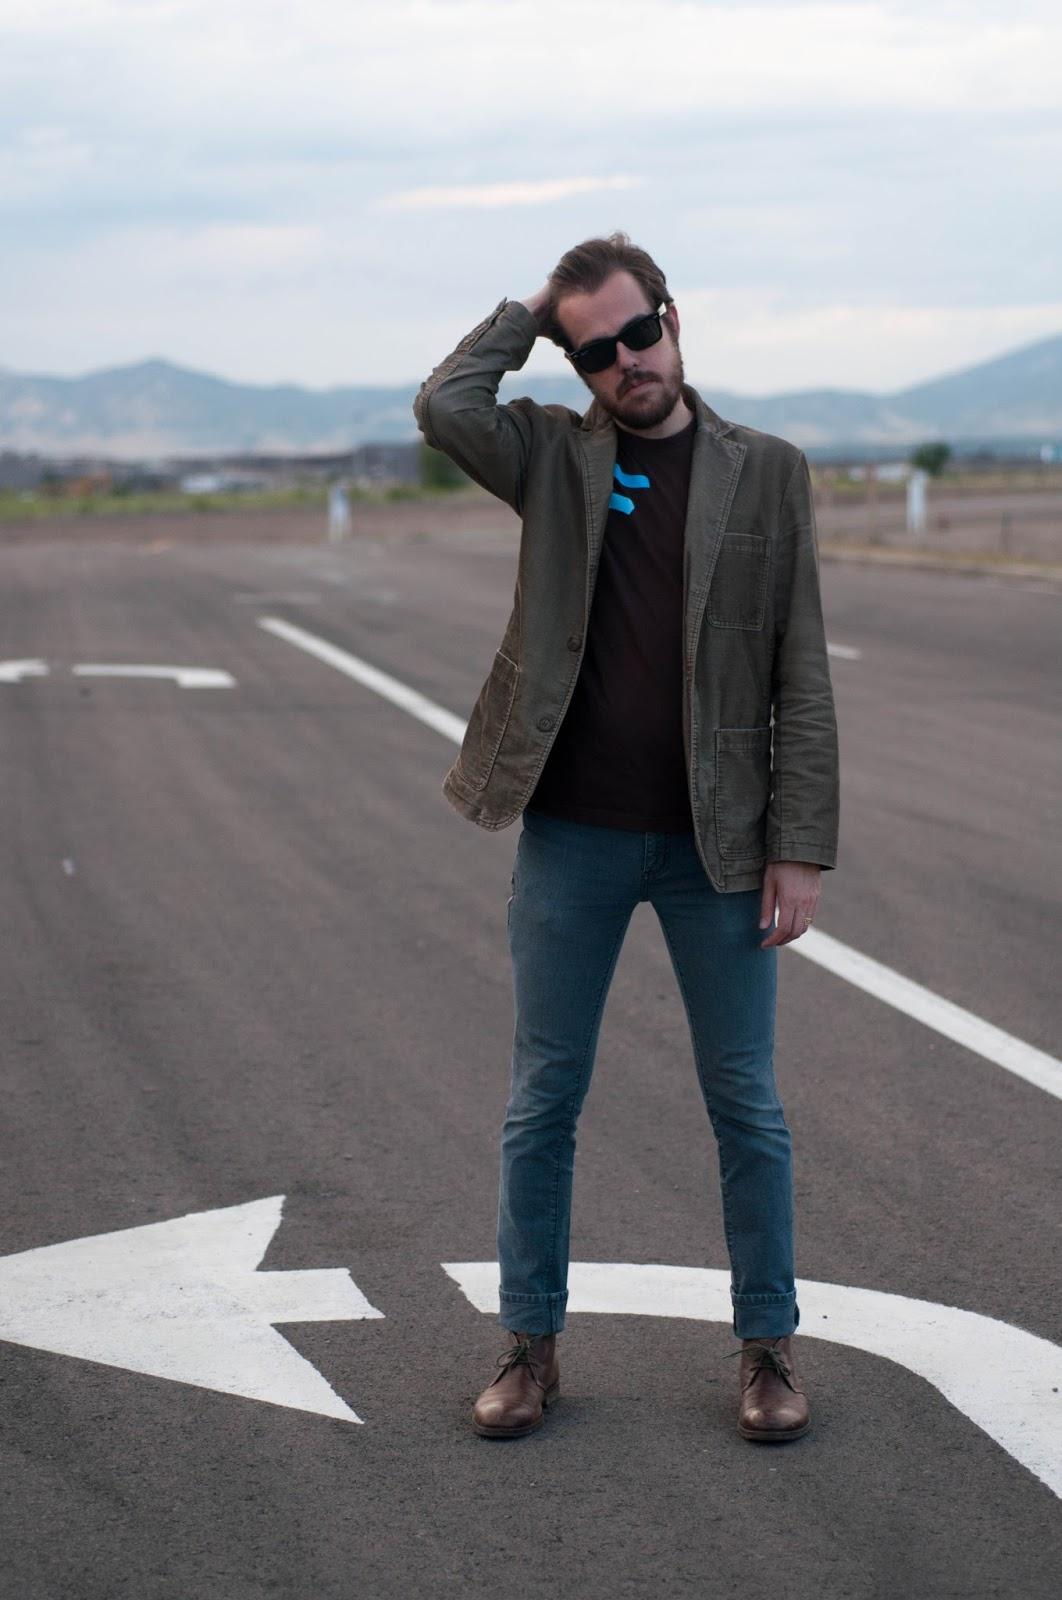 ootd, mens fashion, mens style, gordon rush boots, ray ban sunglasses, corduroy jacket